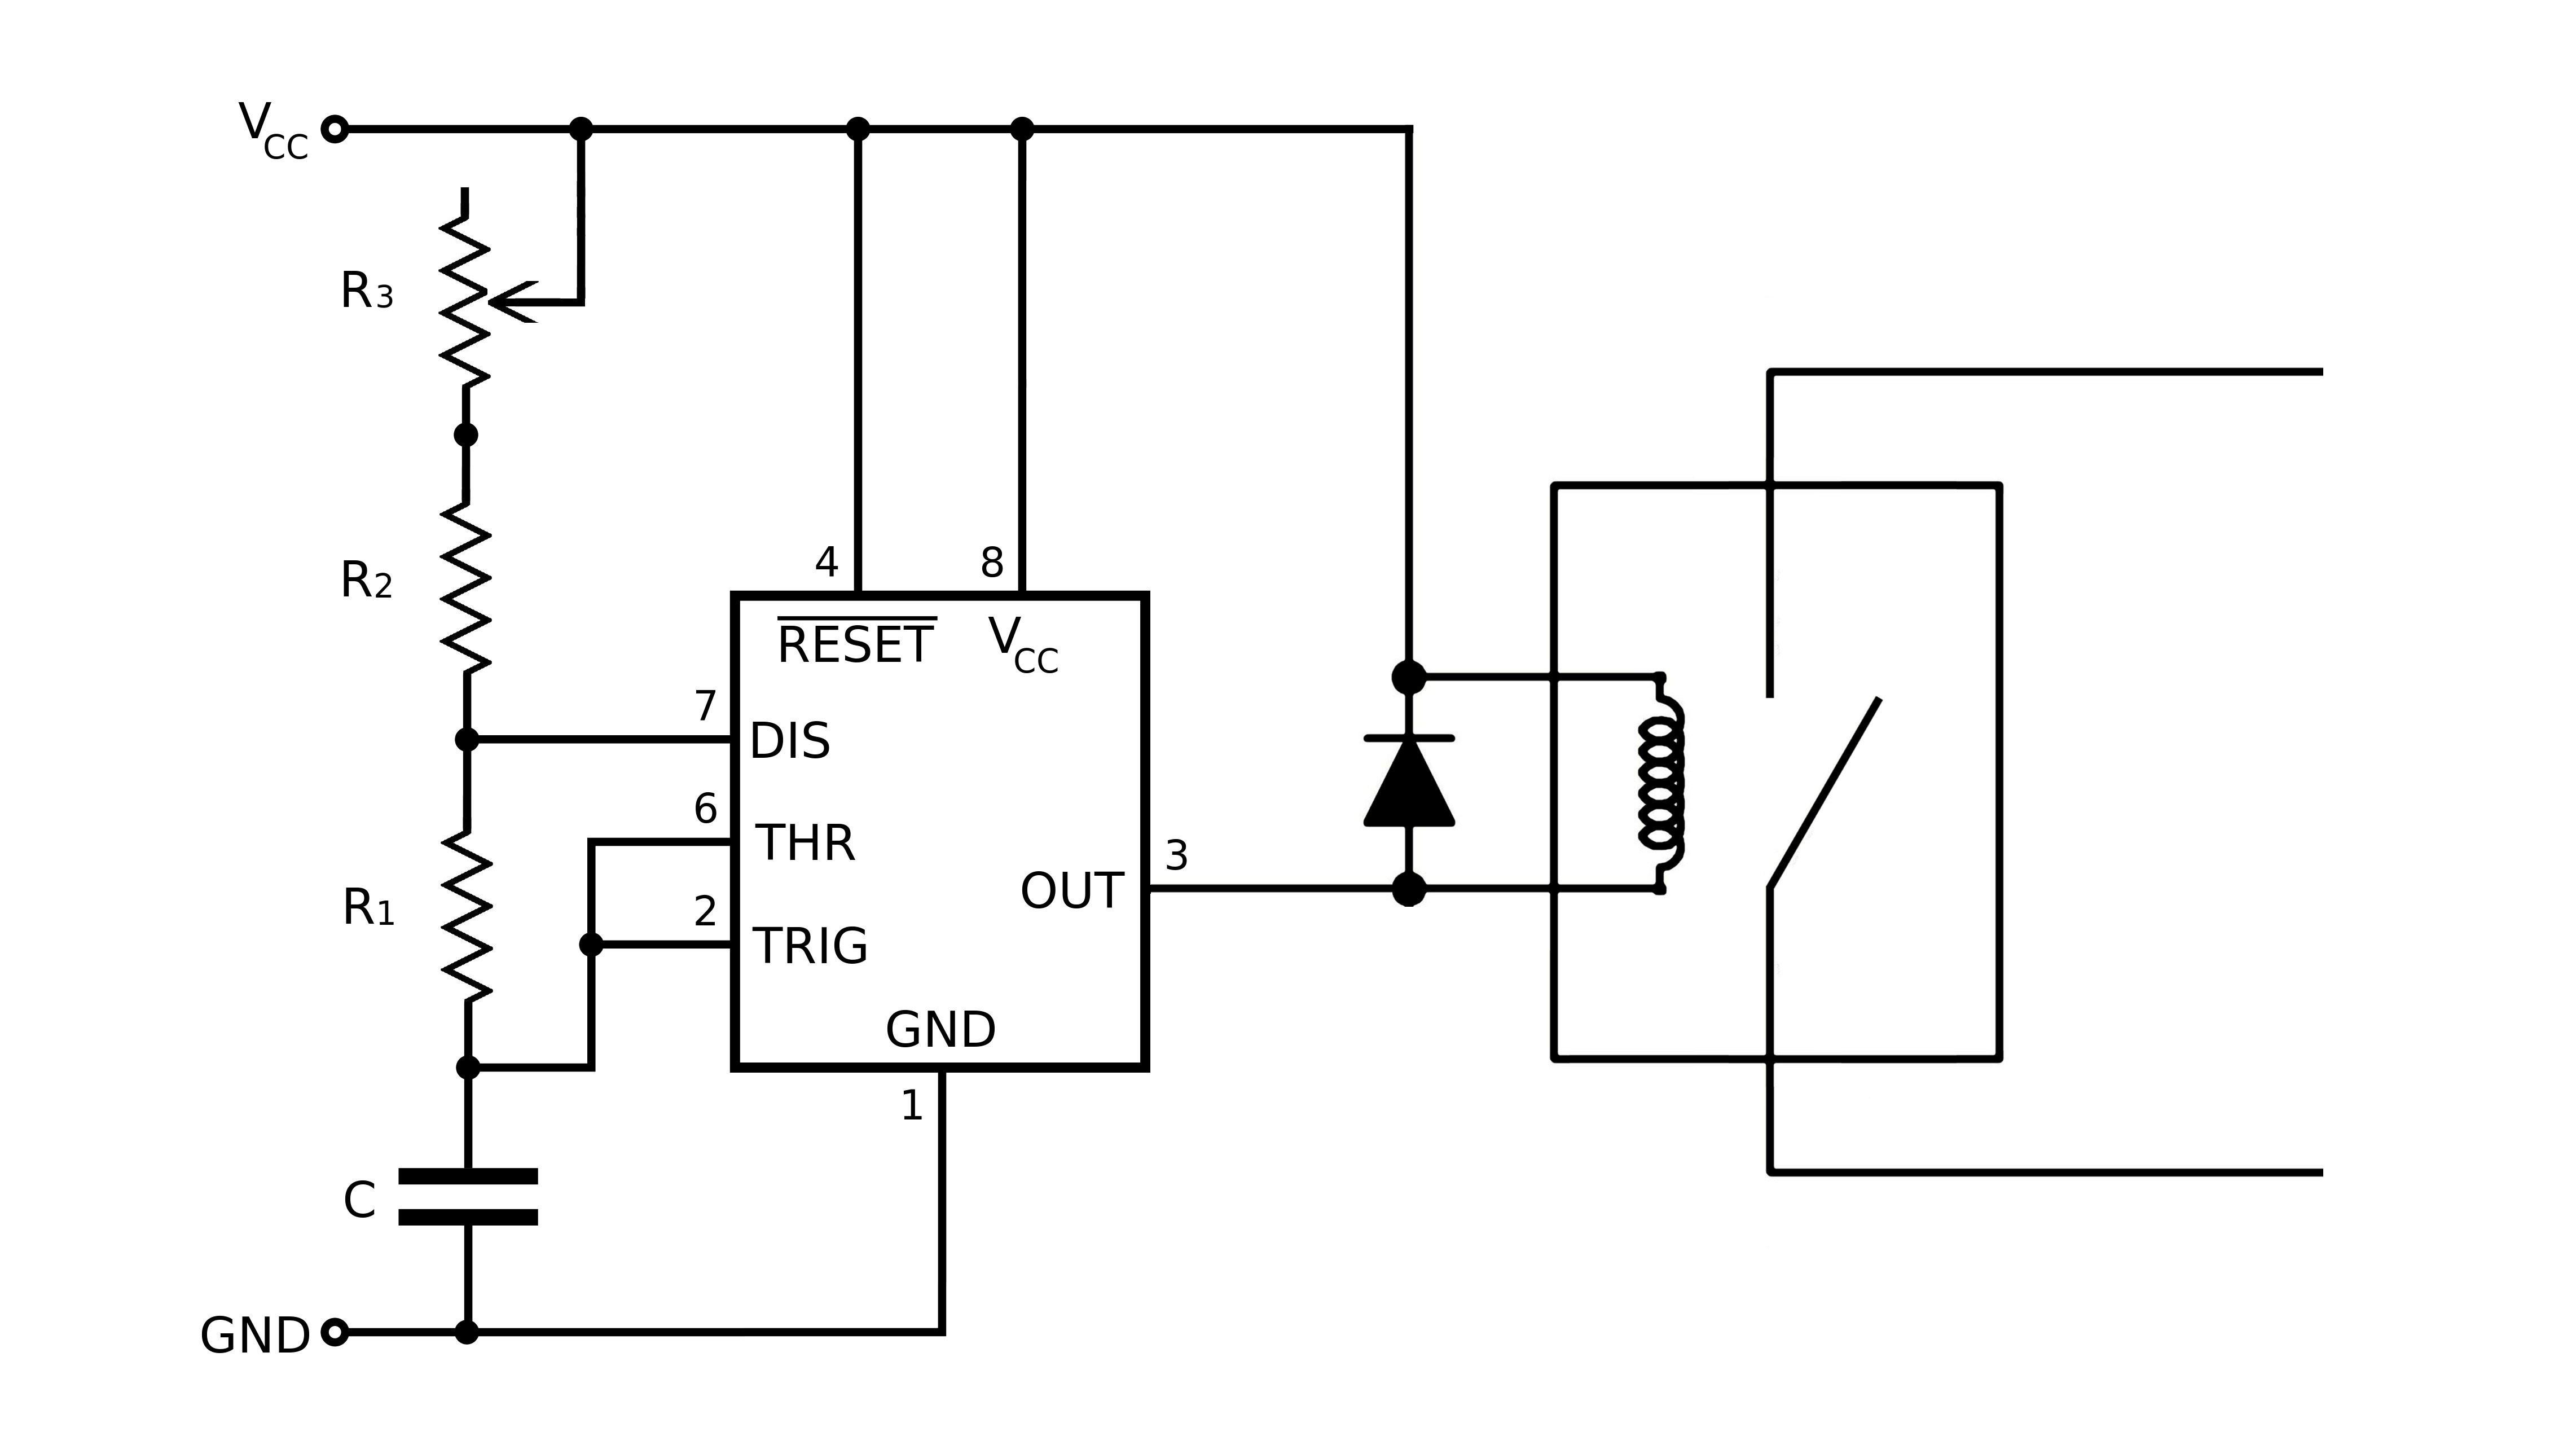 heater wiring diagram on baseboard heater wiring diagram solenoid